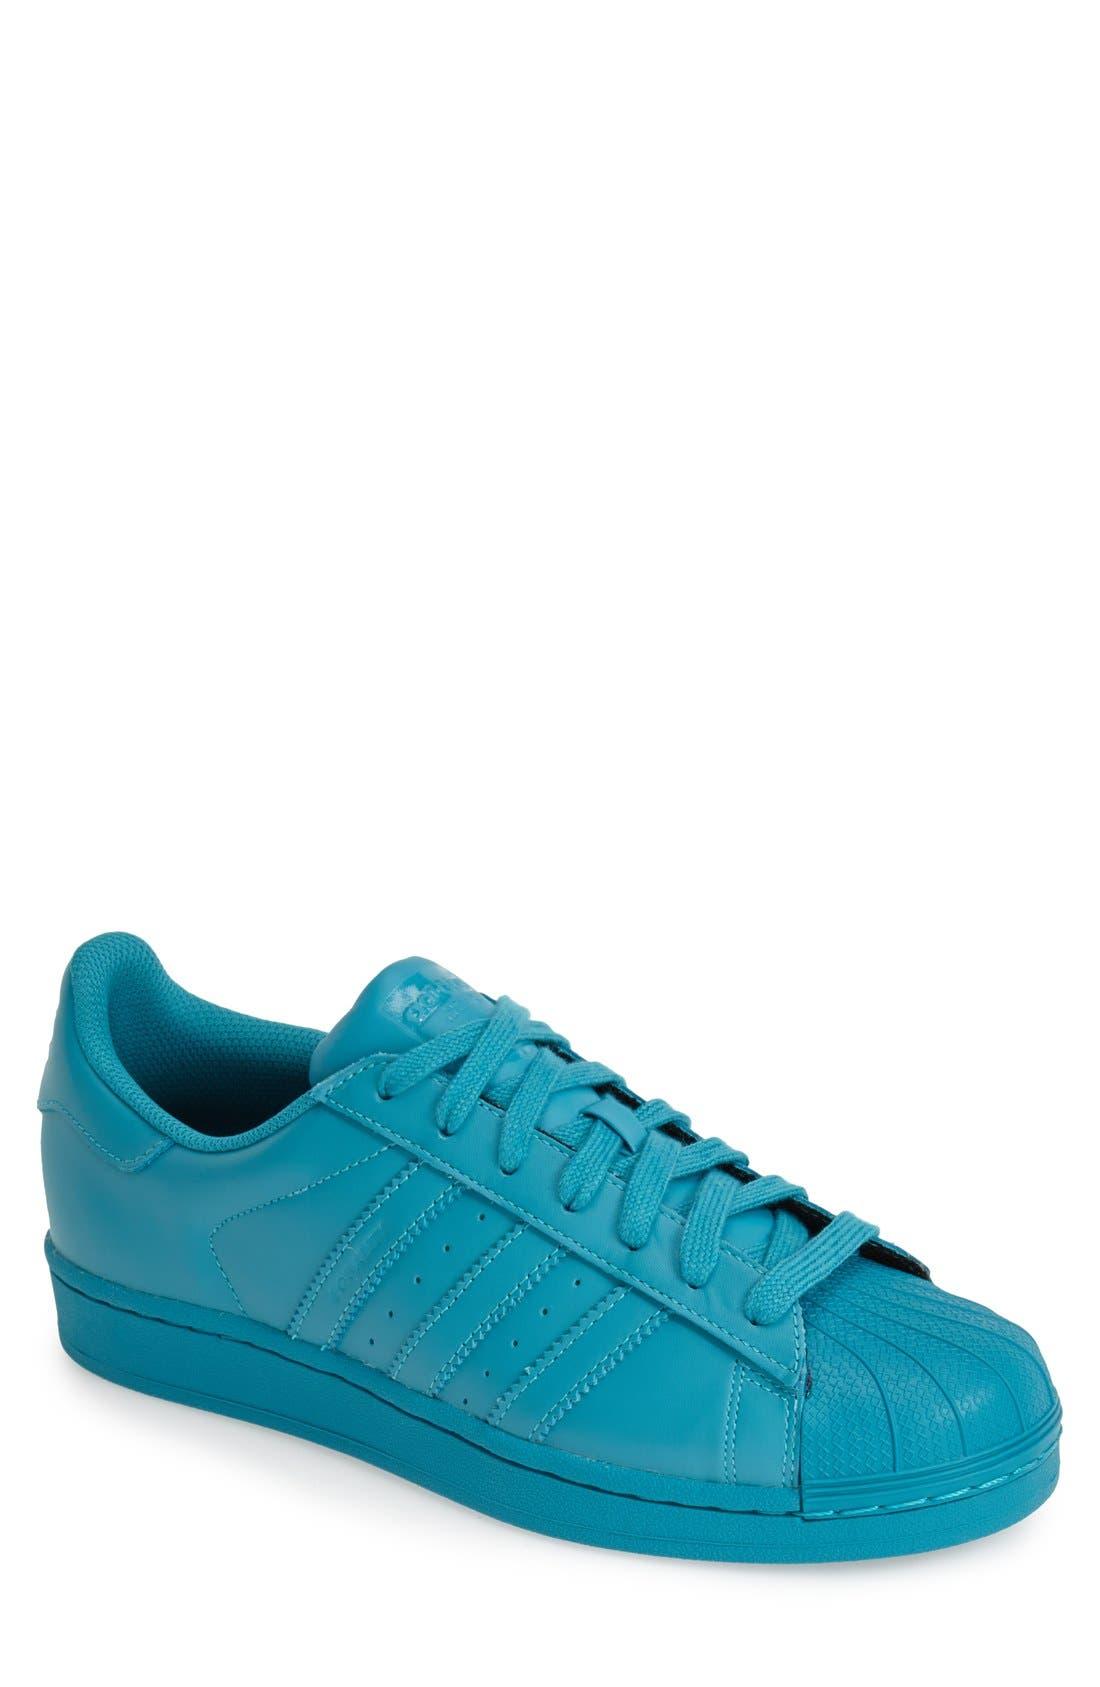 'Pharrell Williams - Superstar Supercolor' Sneaker,                             Main thumbnail 1, color,                             300